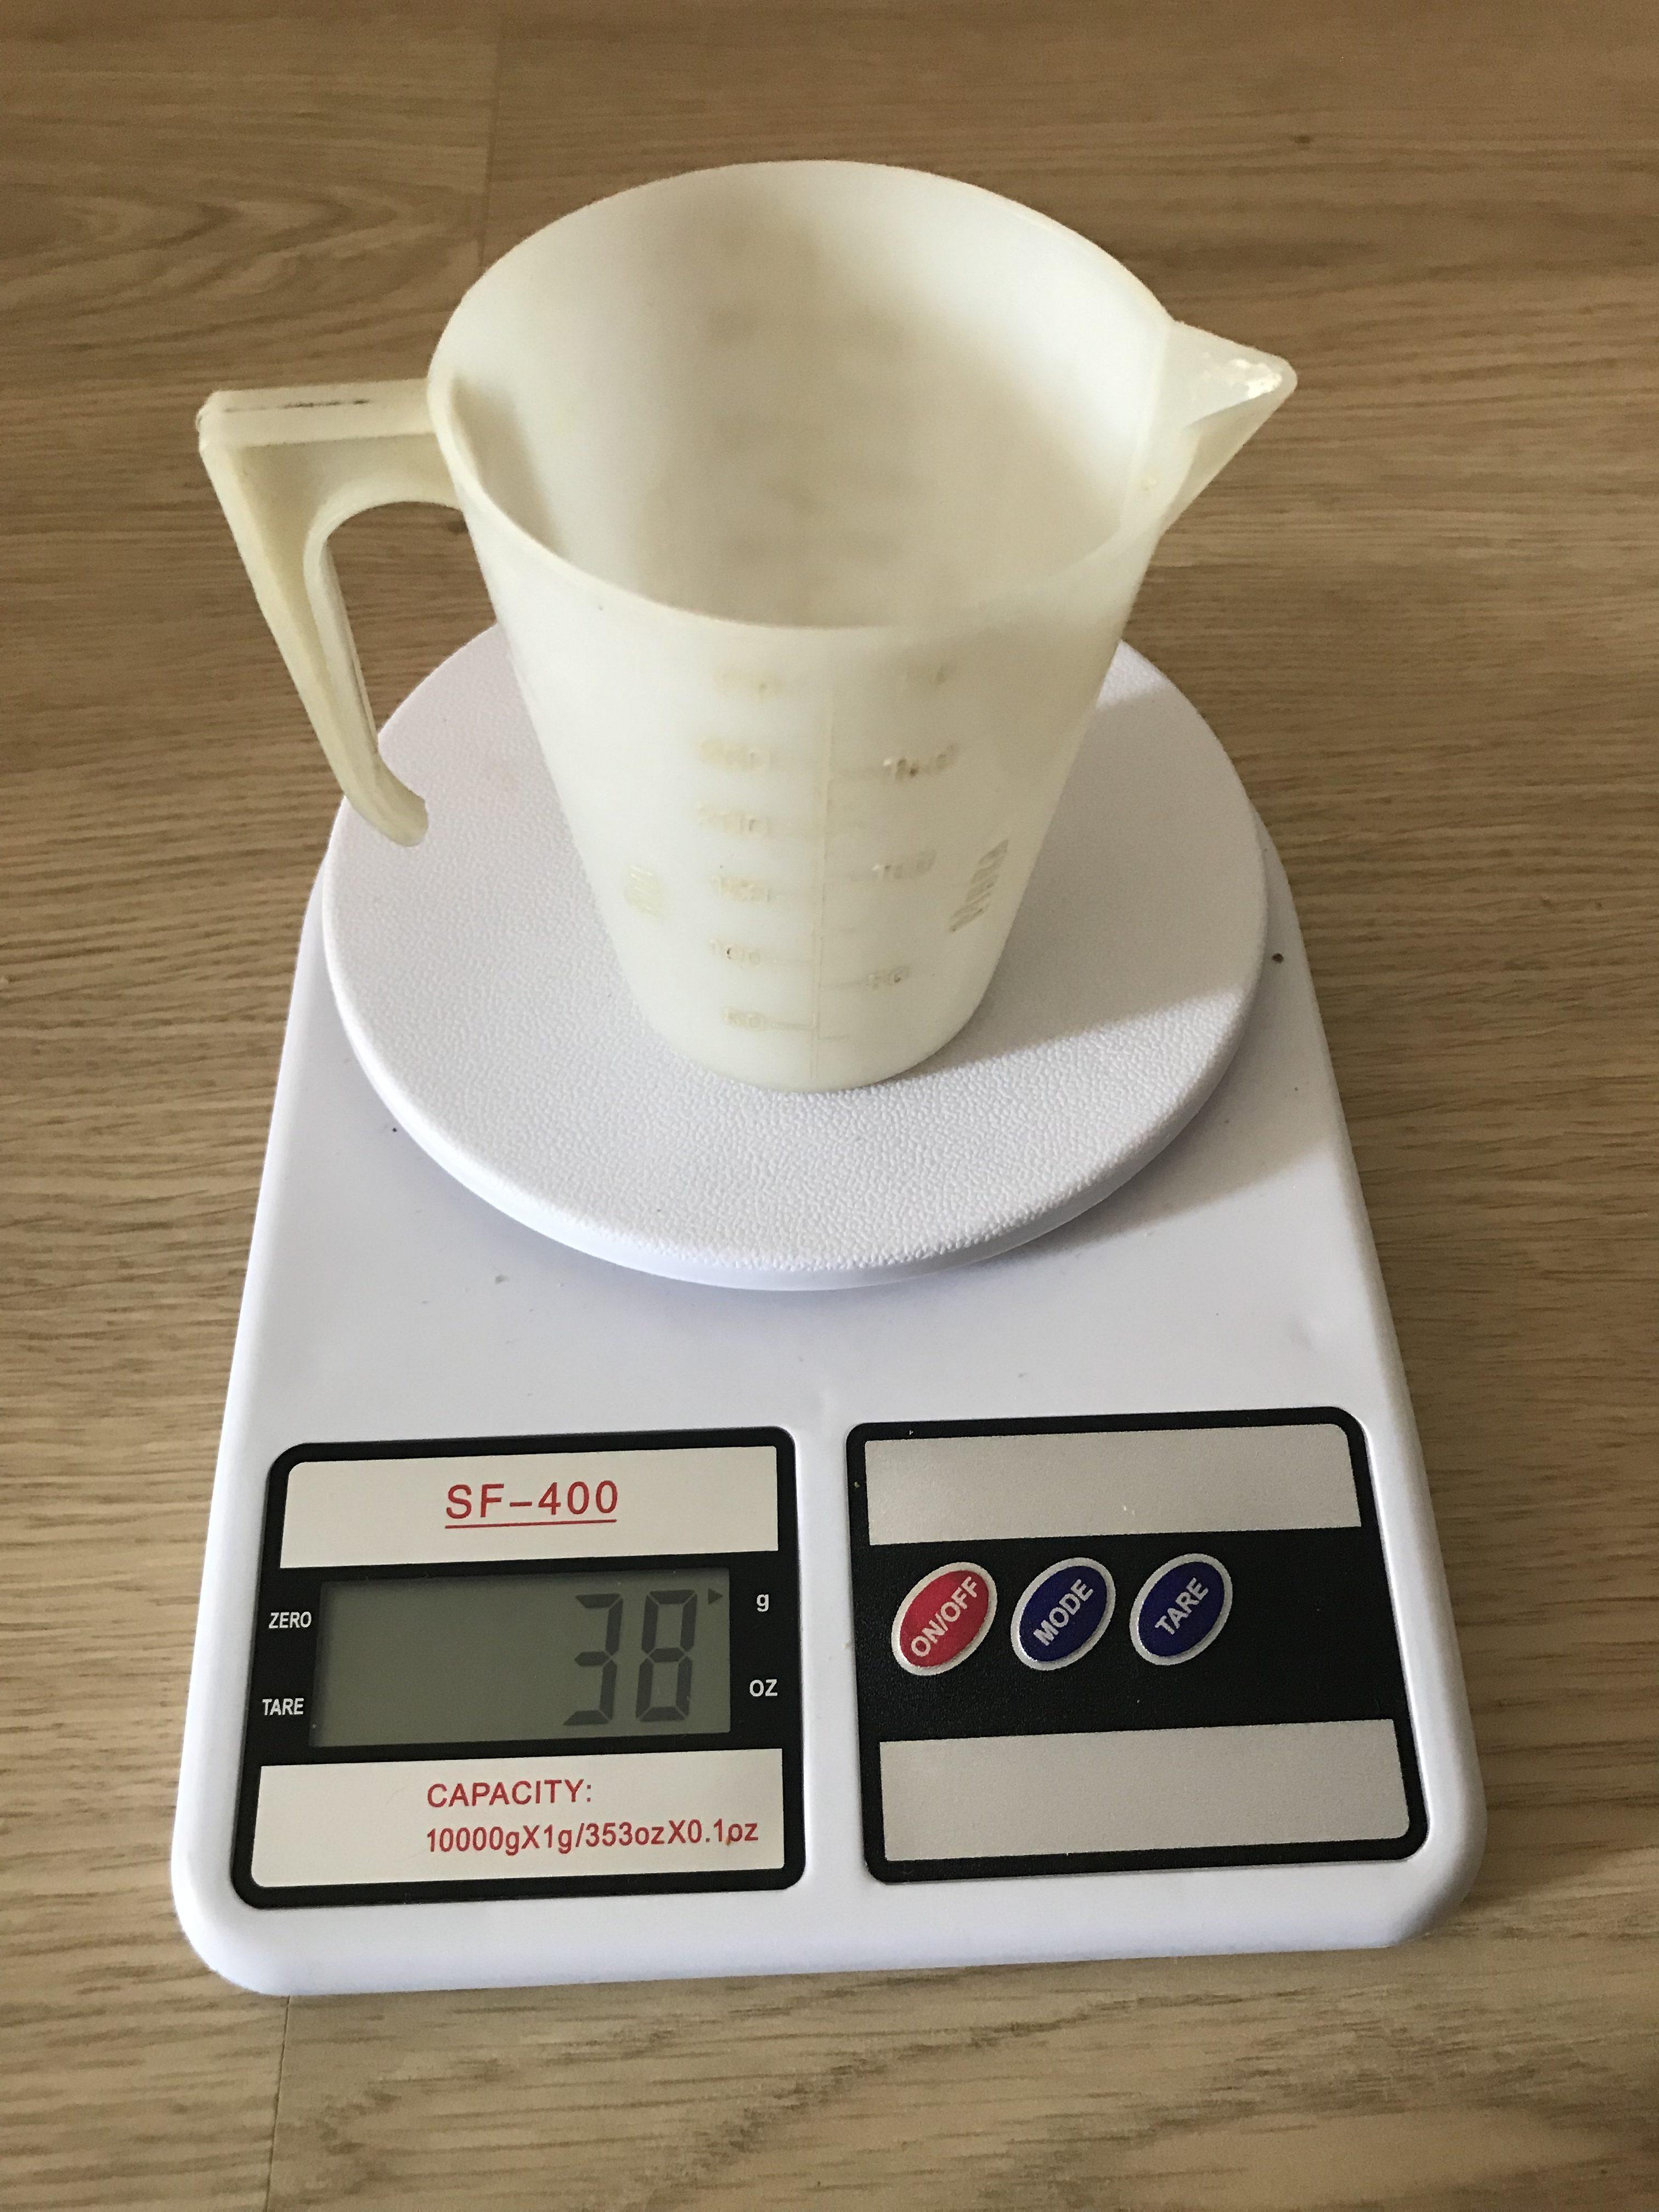 вес мерного стакана